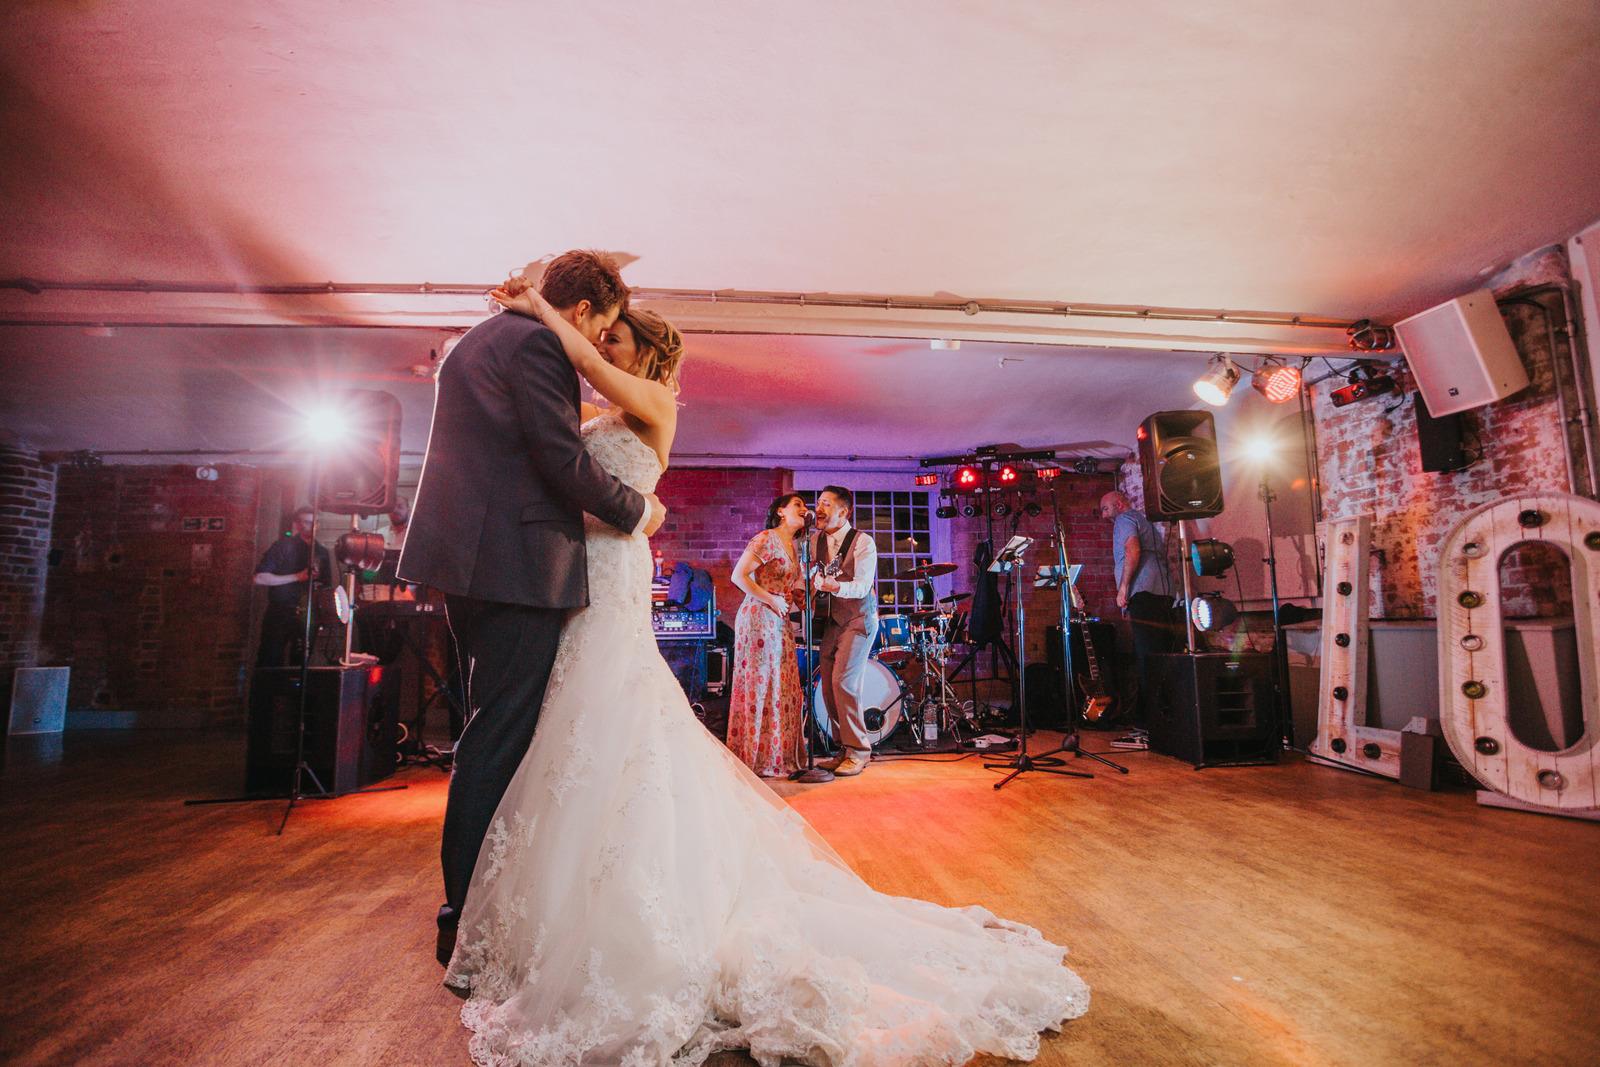 77-Chloe & Tom Wedding-936.jpg